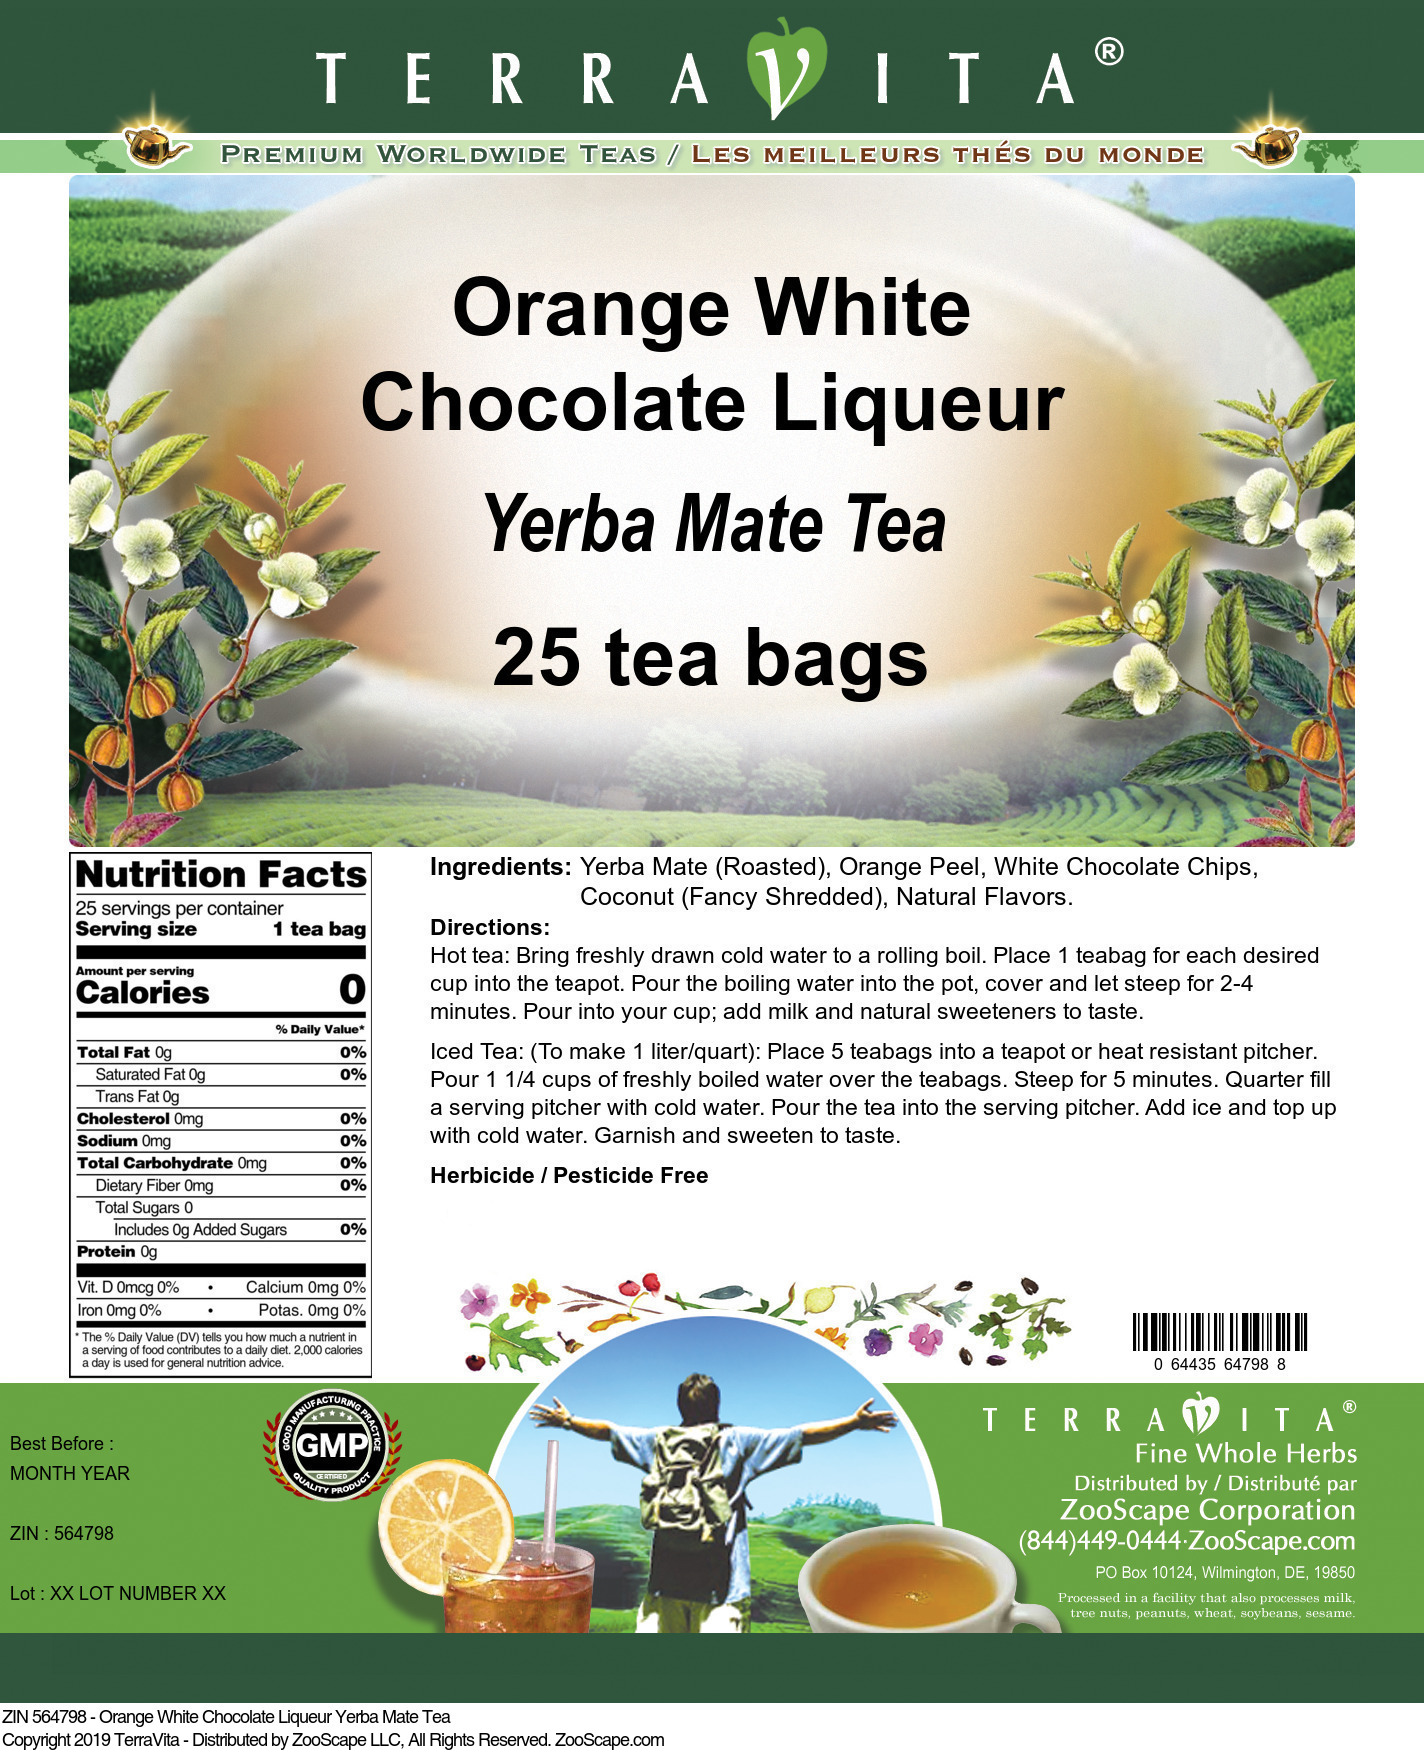 Orange White Chocolate Liqueur Yerba Mate